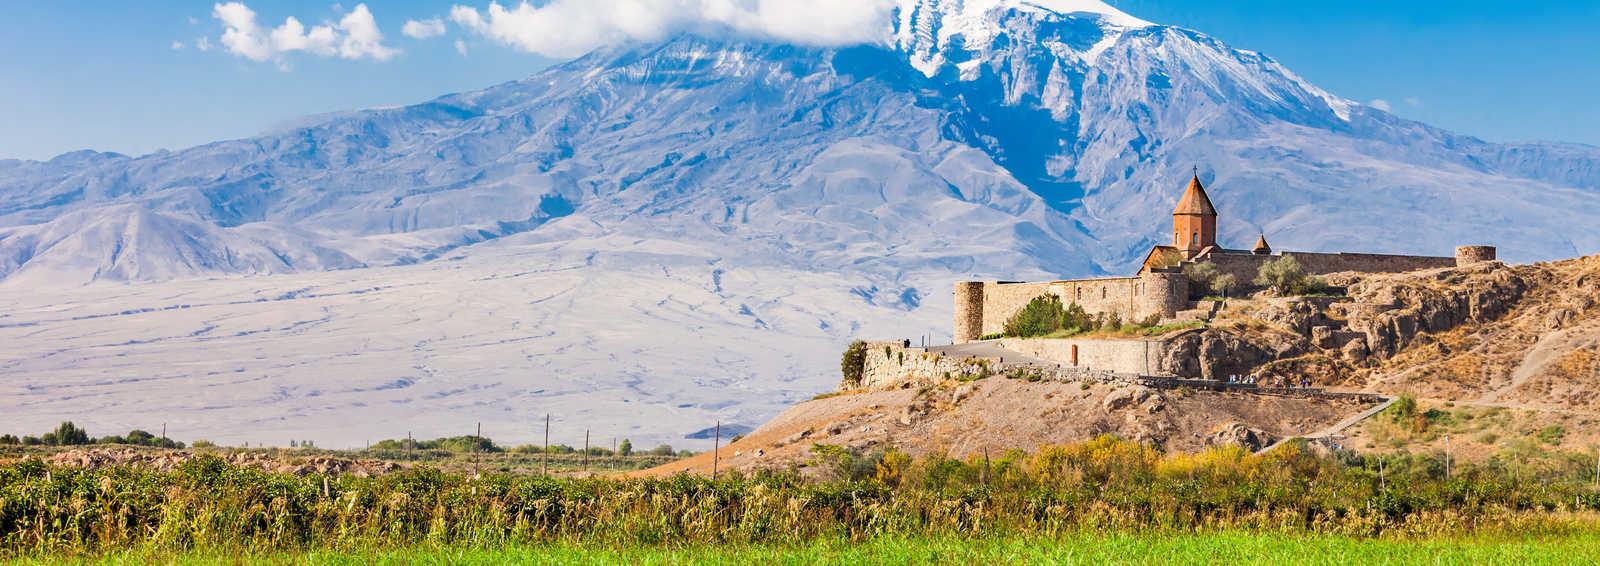 Khor Virap with Mount Ararat in background, Armenia